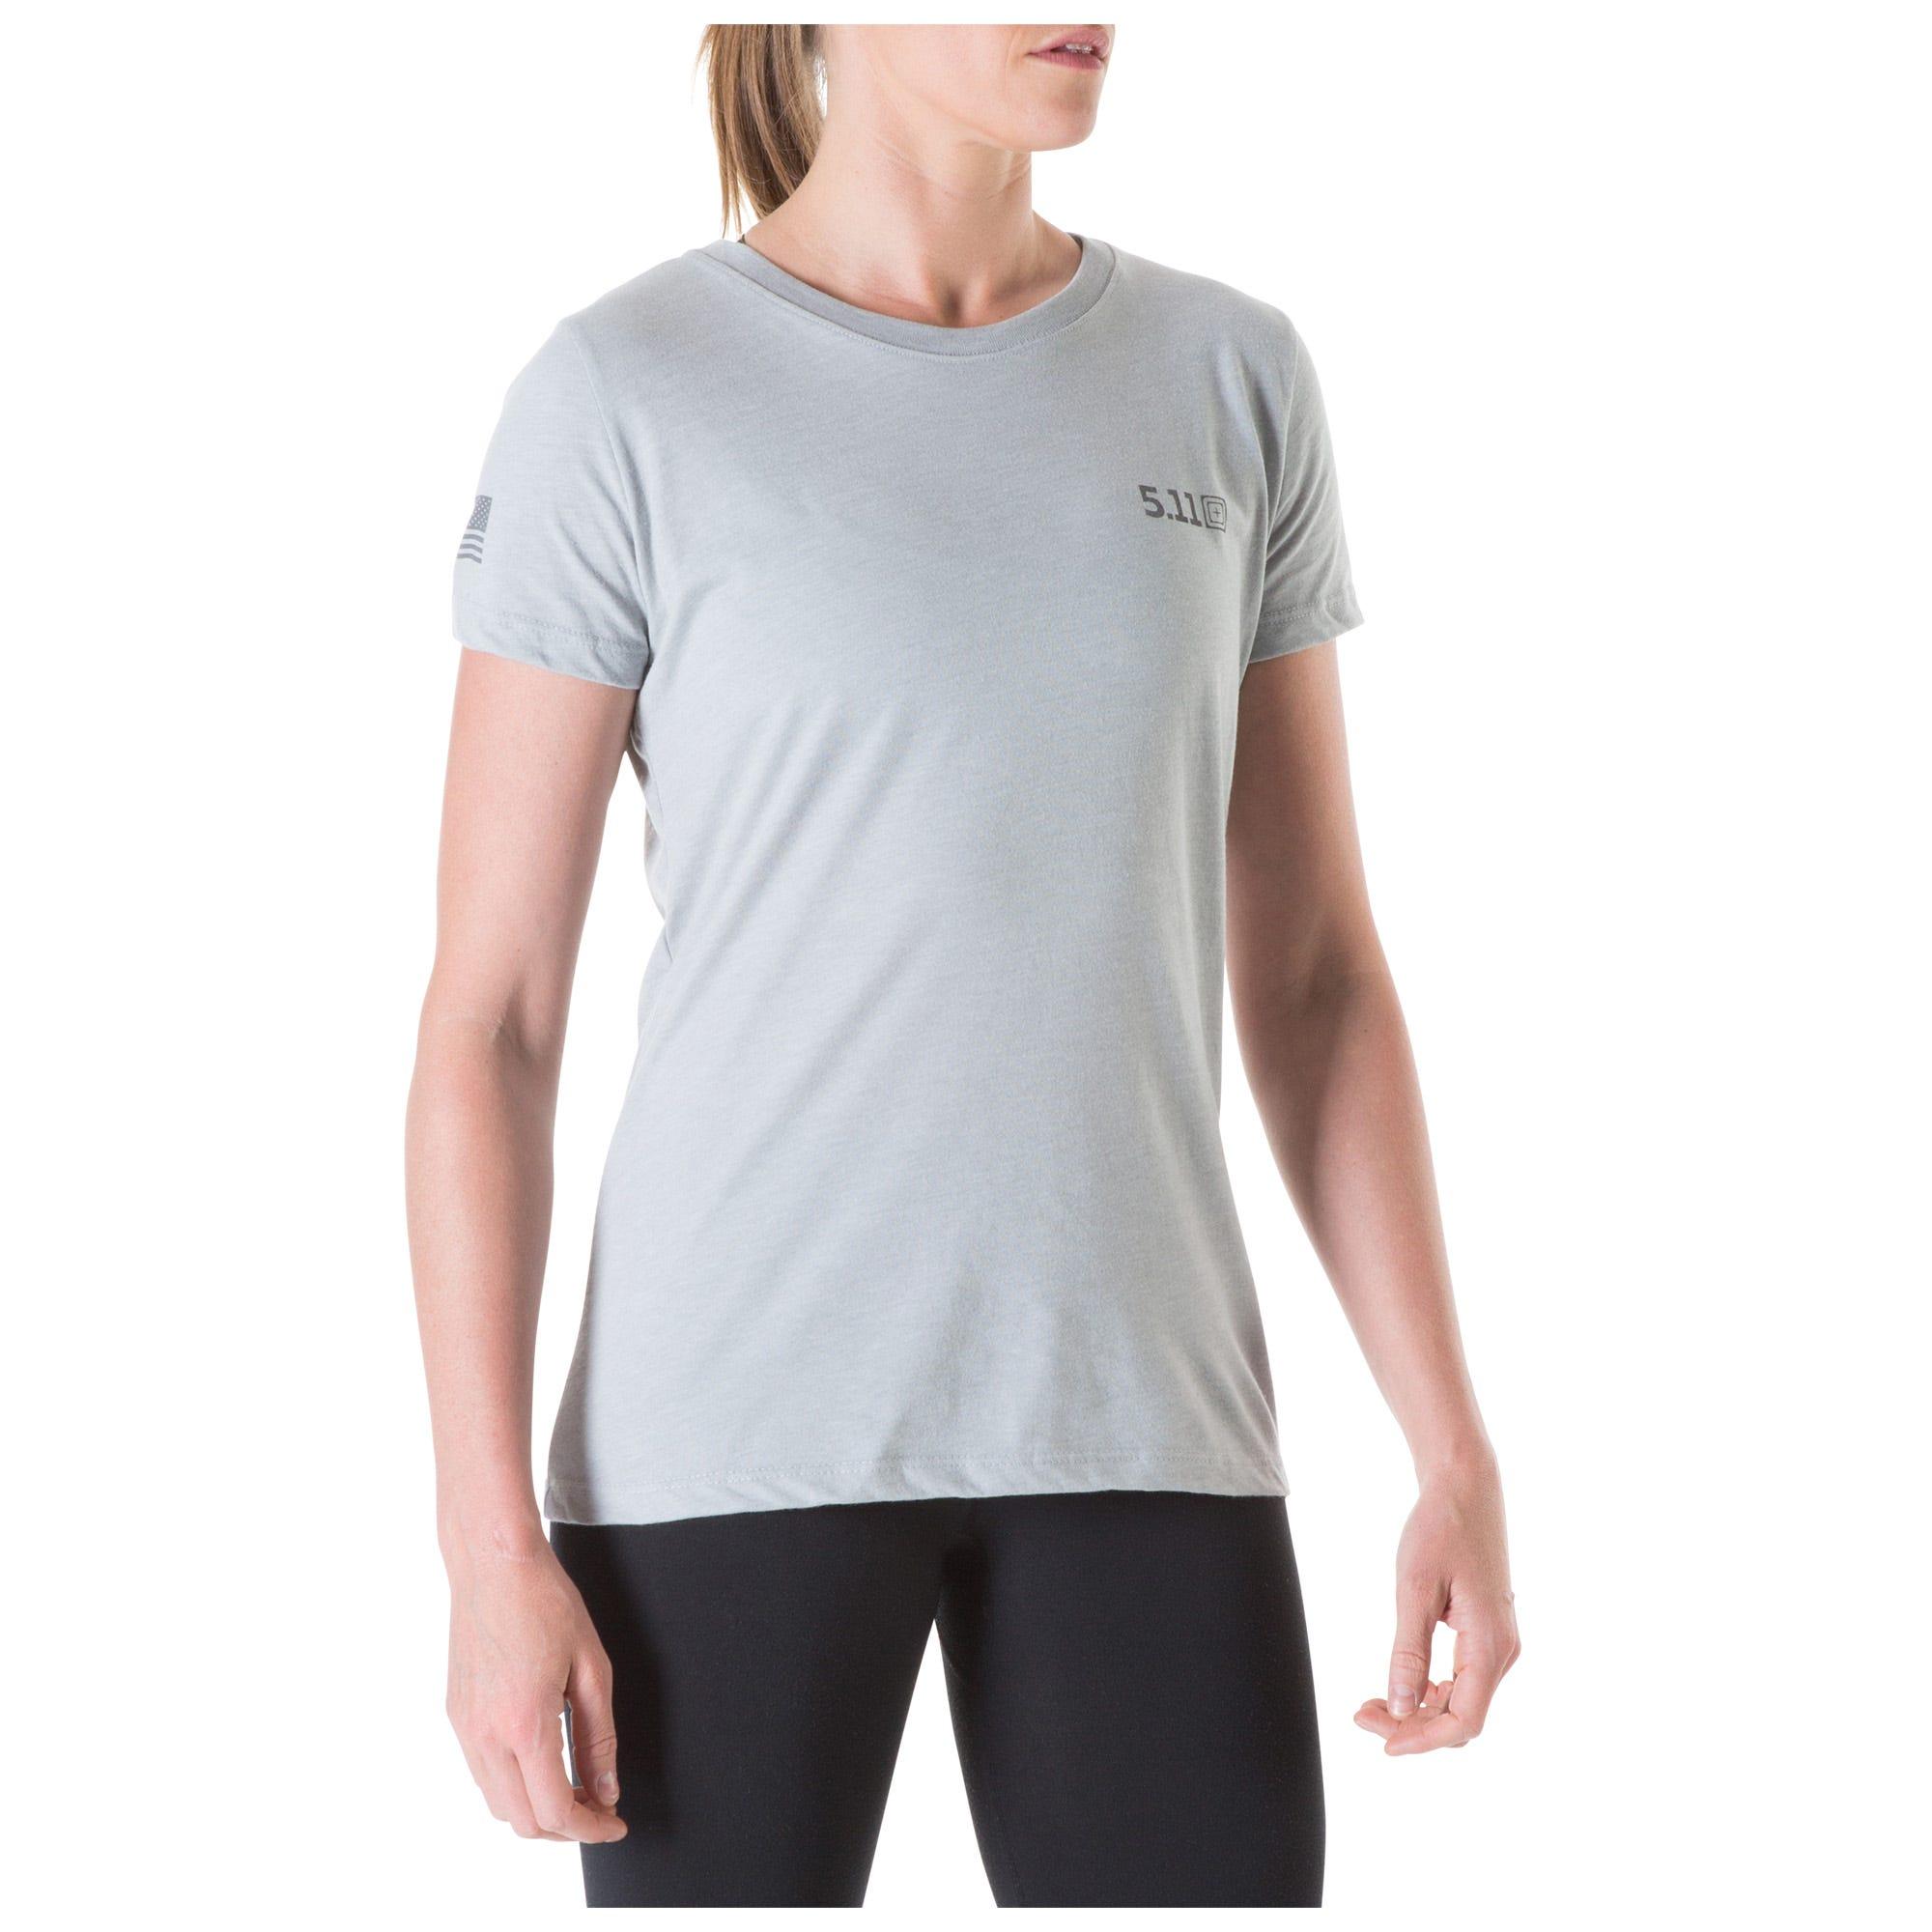 5.11 Tactical Women Women's Short Sleeve Performance Tee (Grey)